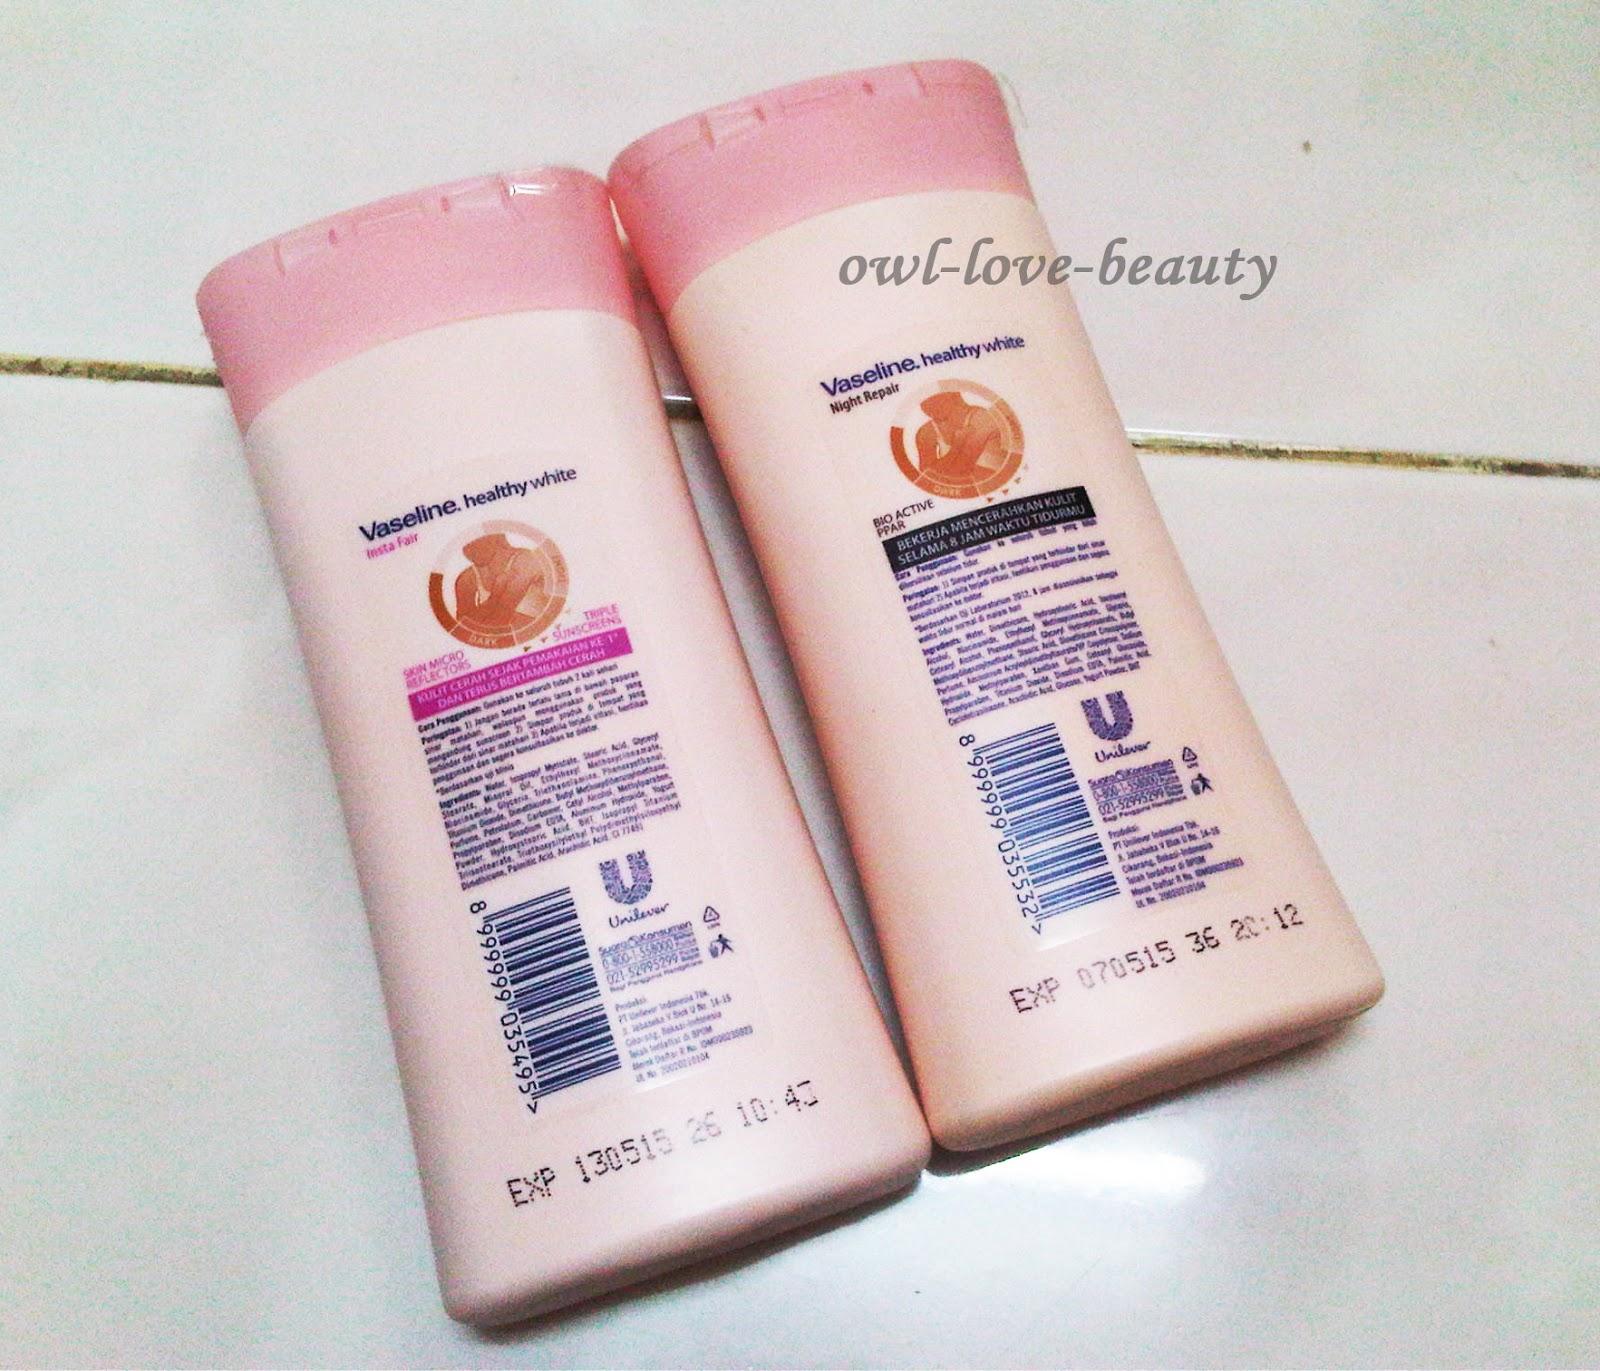 Senka White Beauty Lotion Ii Review: Owl-love-beauty: Review: Vaseline Healthy White